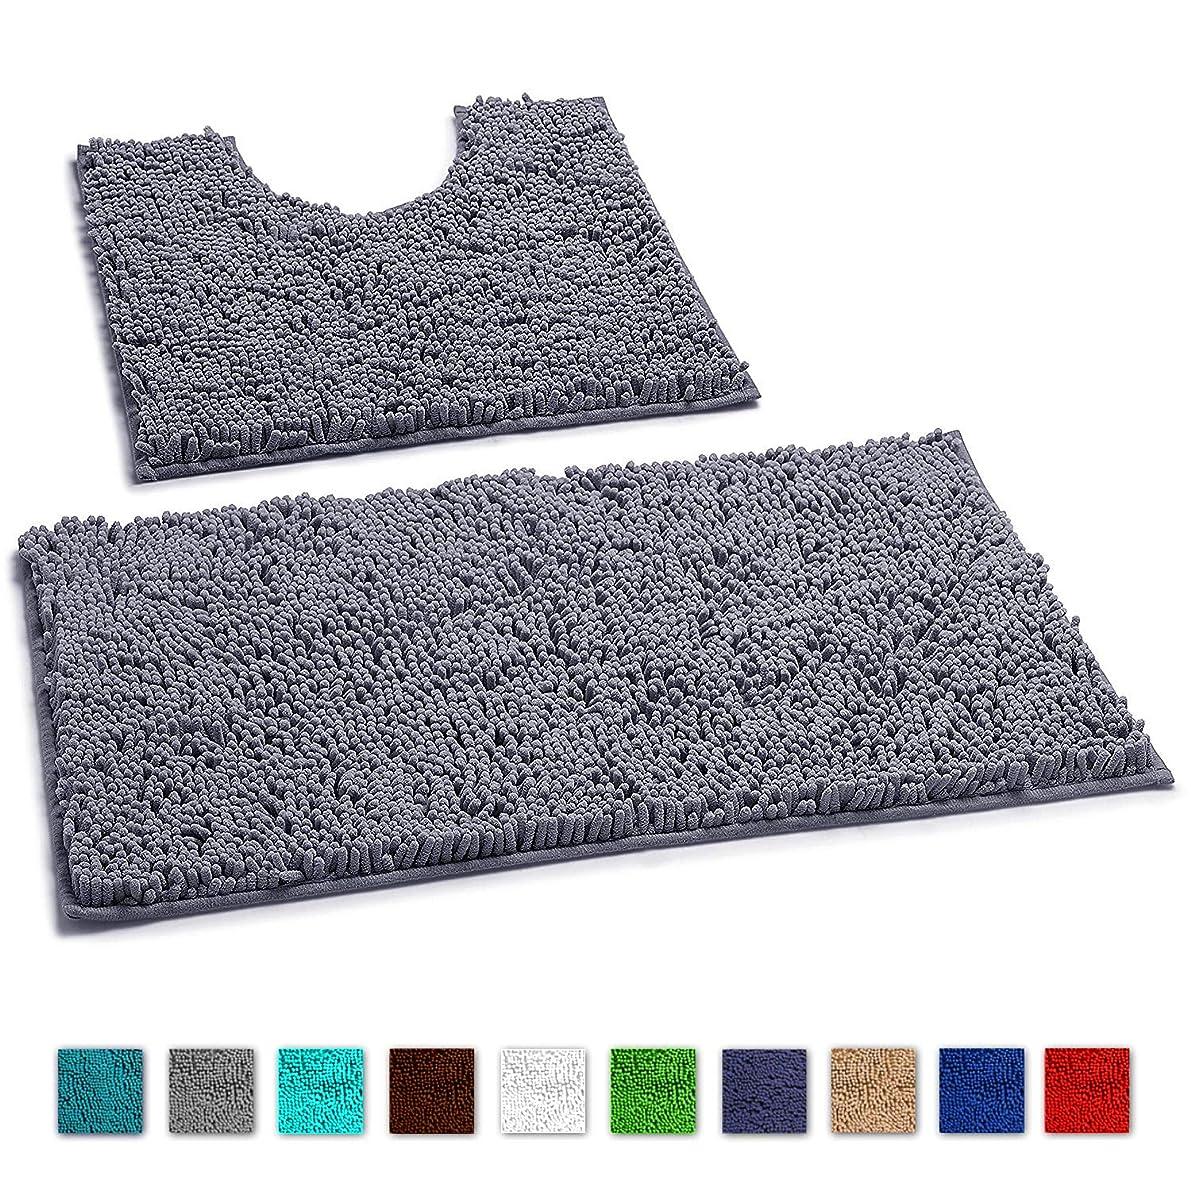 LuxUrux Bathroom Rugs Luxury Chenille 2-Piece Mat Set, Soft Plush Anti-Slip Shower Rug +Toilet Mat.1'' Microfiber Shaggy Carpet, Super Absorbent mats, Machine Washable Bath Mat (Curved Set, Dark Gray)